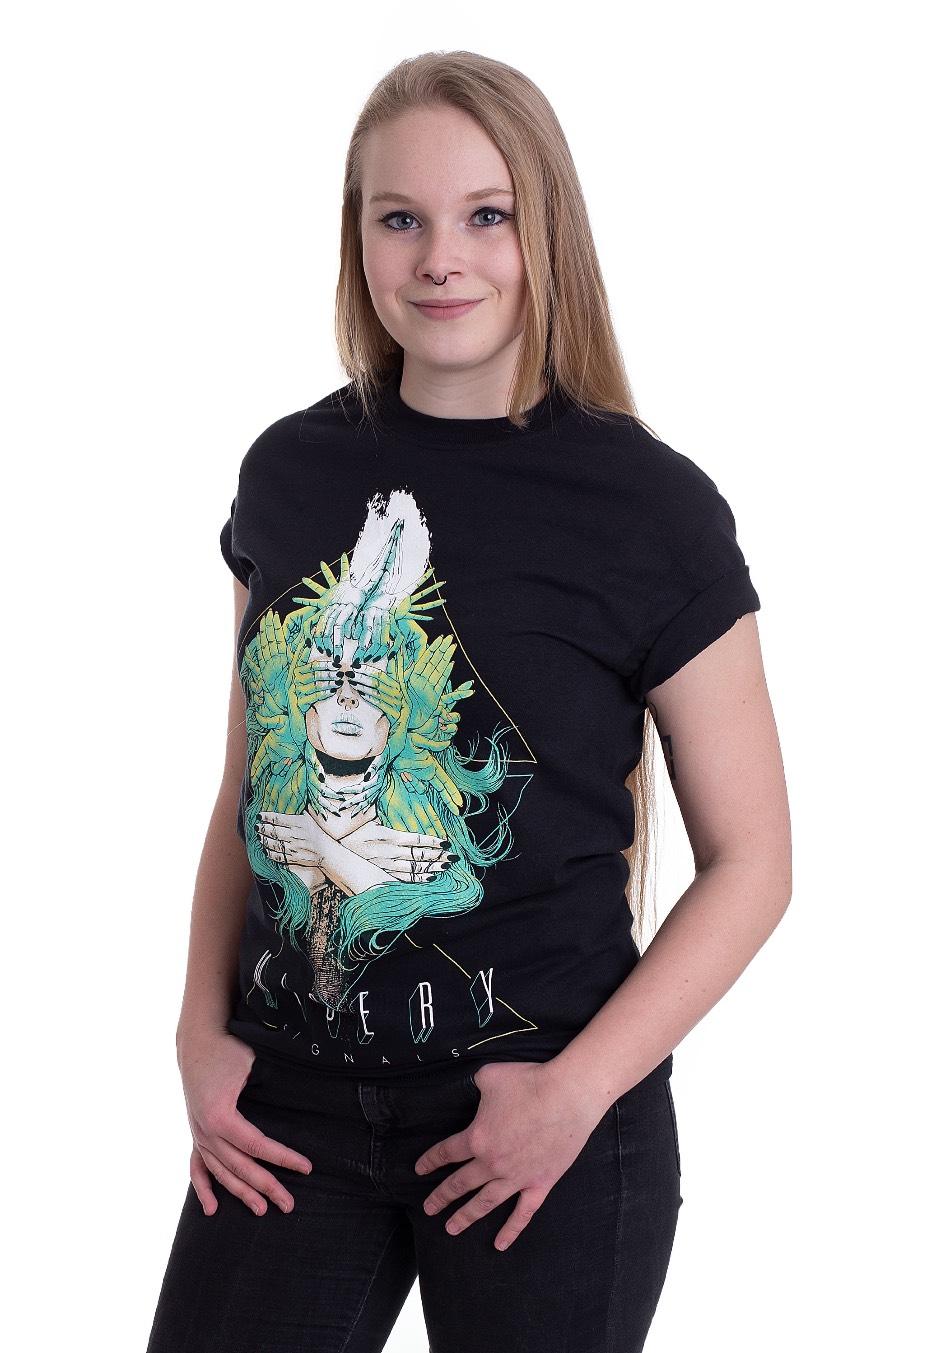 7f00e3bf Misery Signals - Girl Hand - T-Shirt - Impericon.com AU